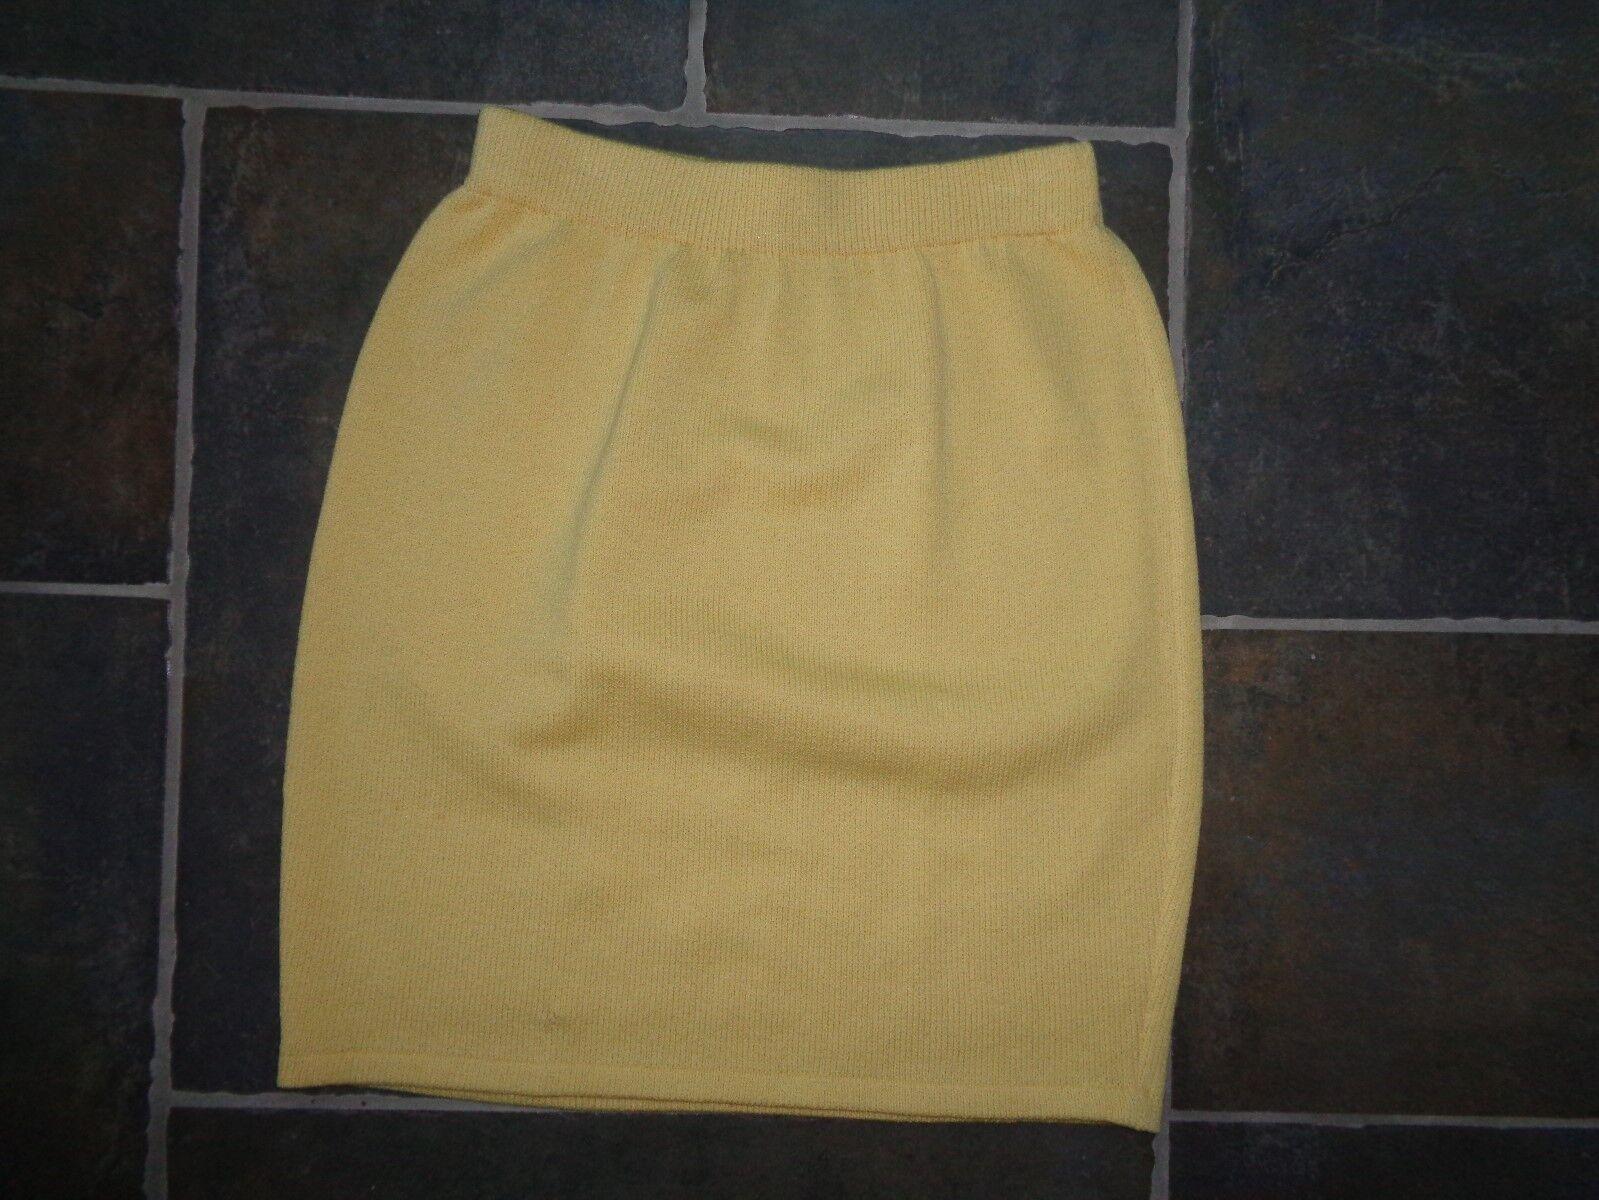 St John Collection Women's Size 2 Yellow Santana Knit Skirt